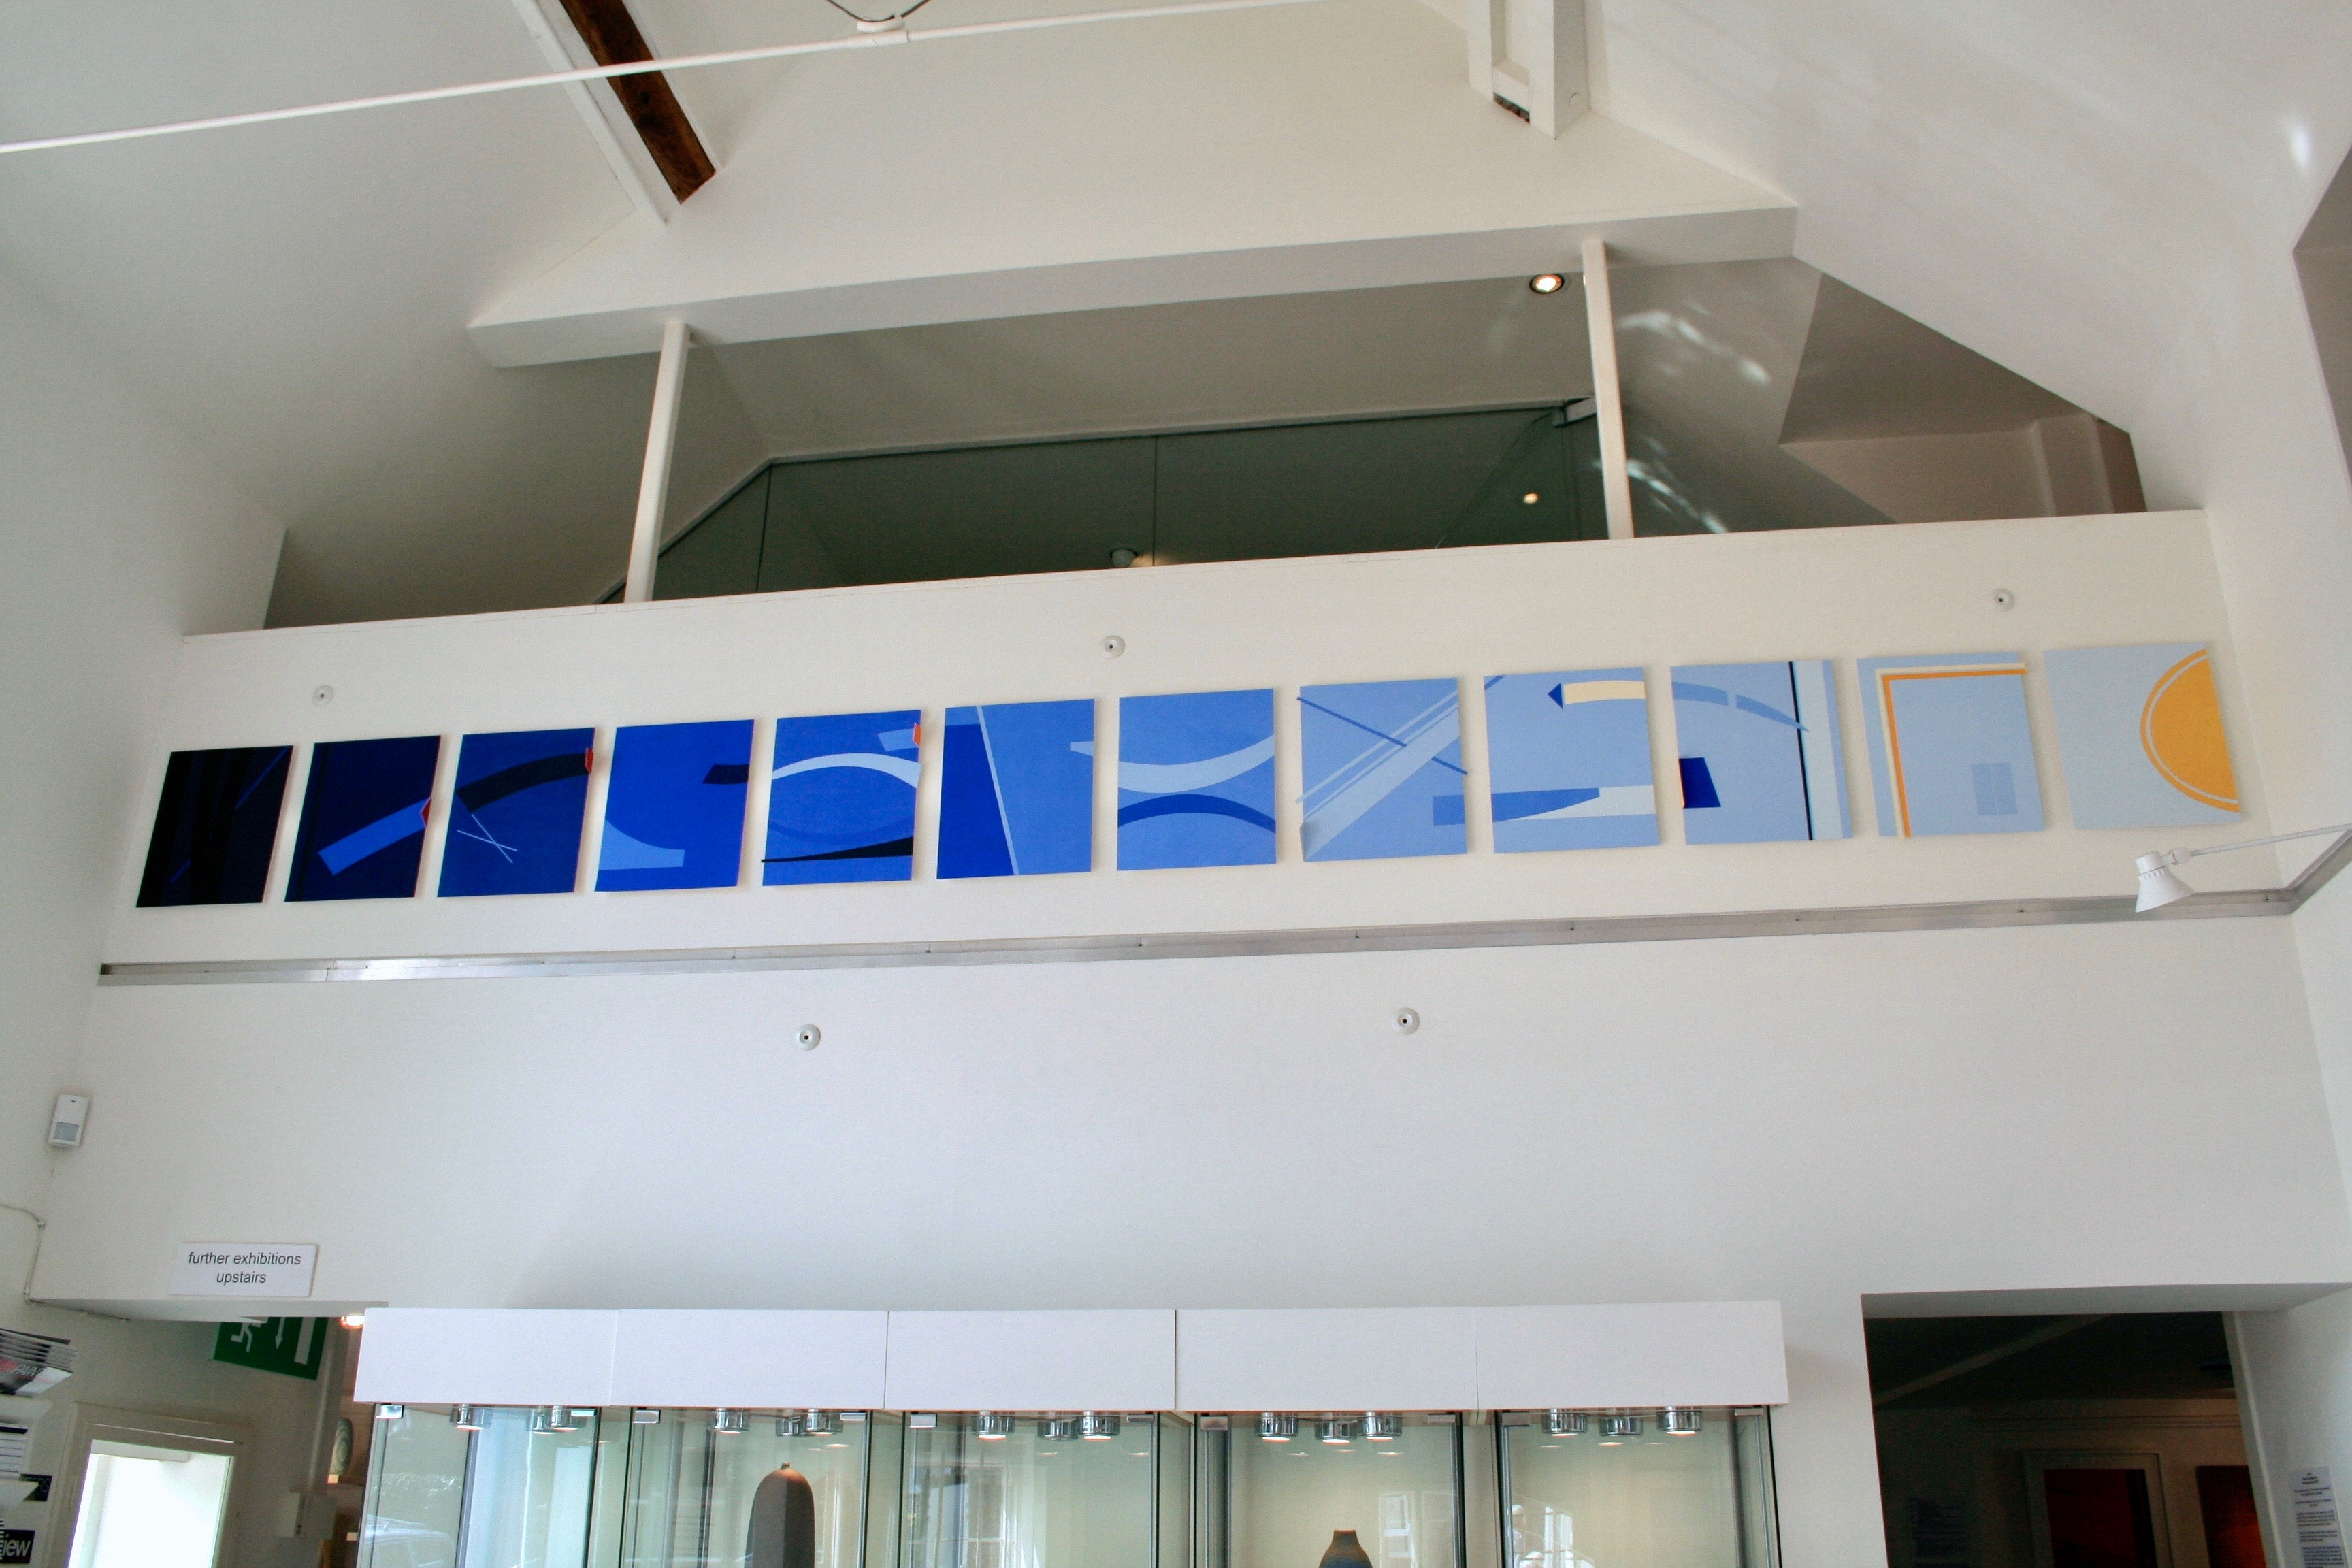 Blue Installation: New Ashgate Gallery